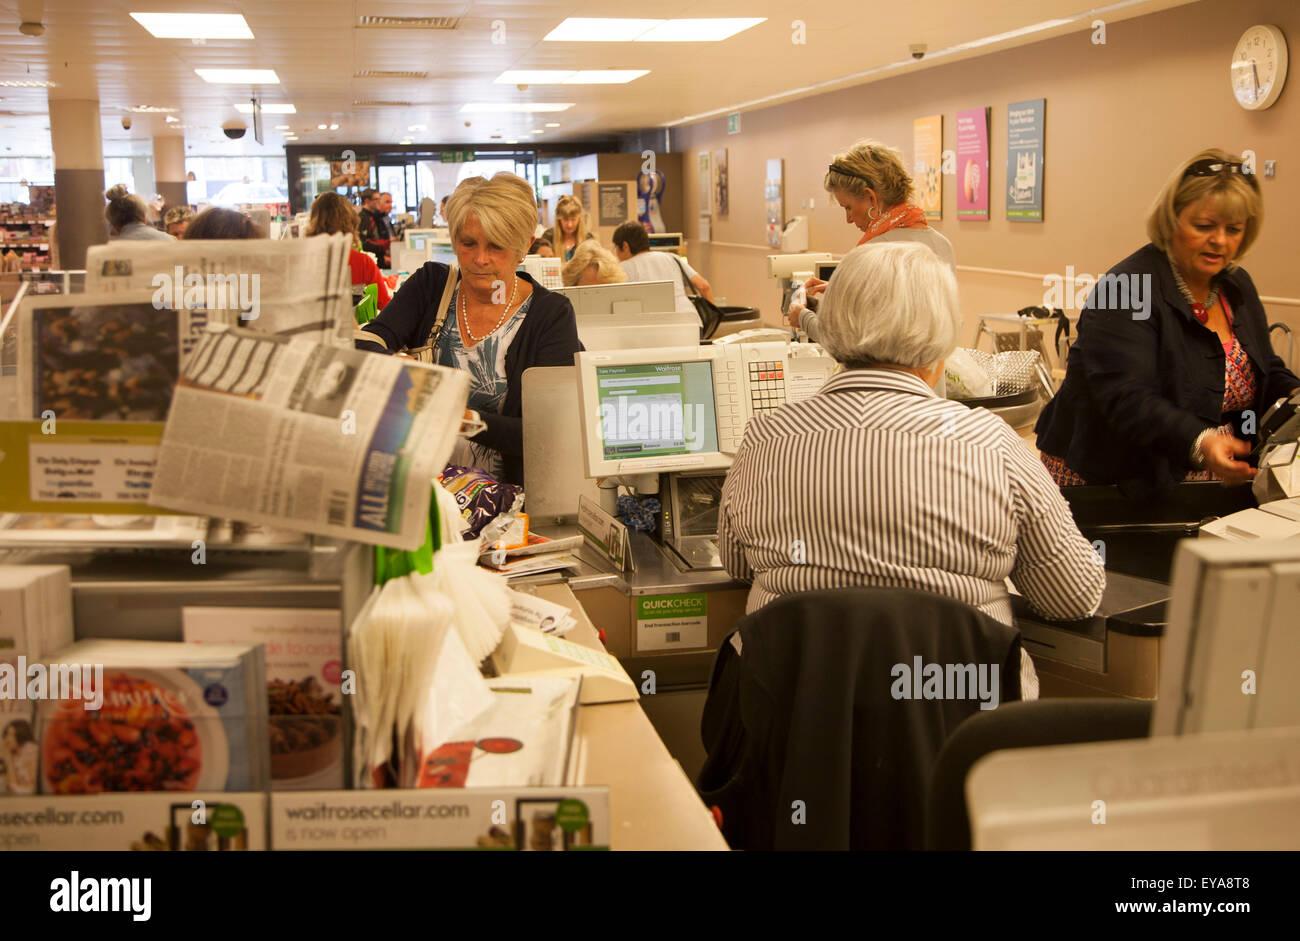 People at supermarket check-outs inside Waitrose store, Marlborough, Wiltshire, England, UK - Stock Image